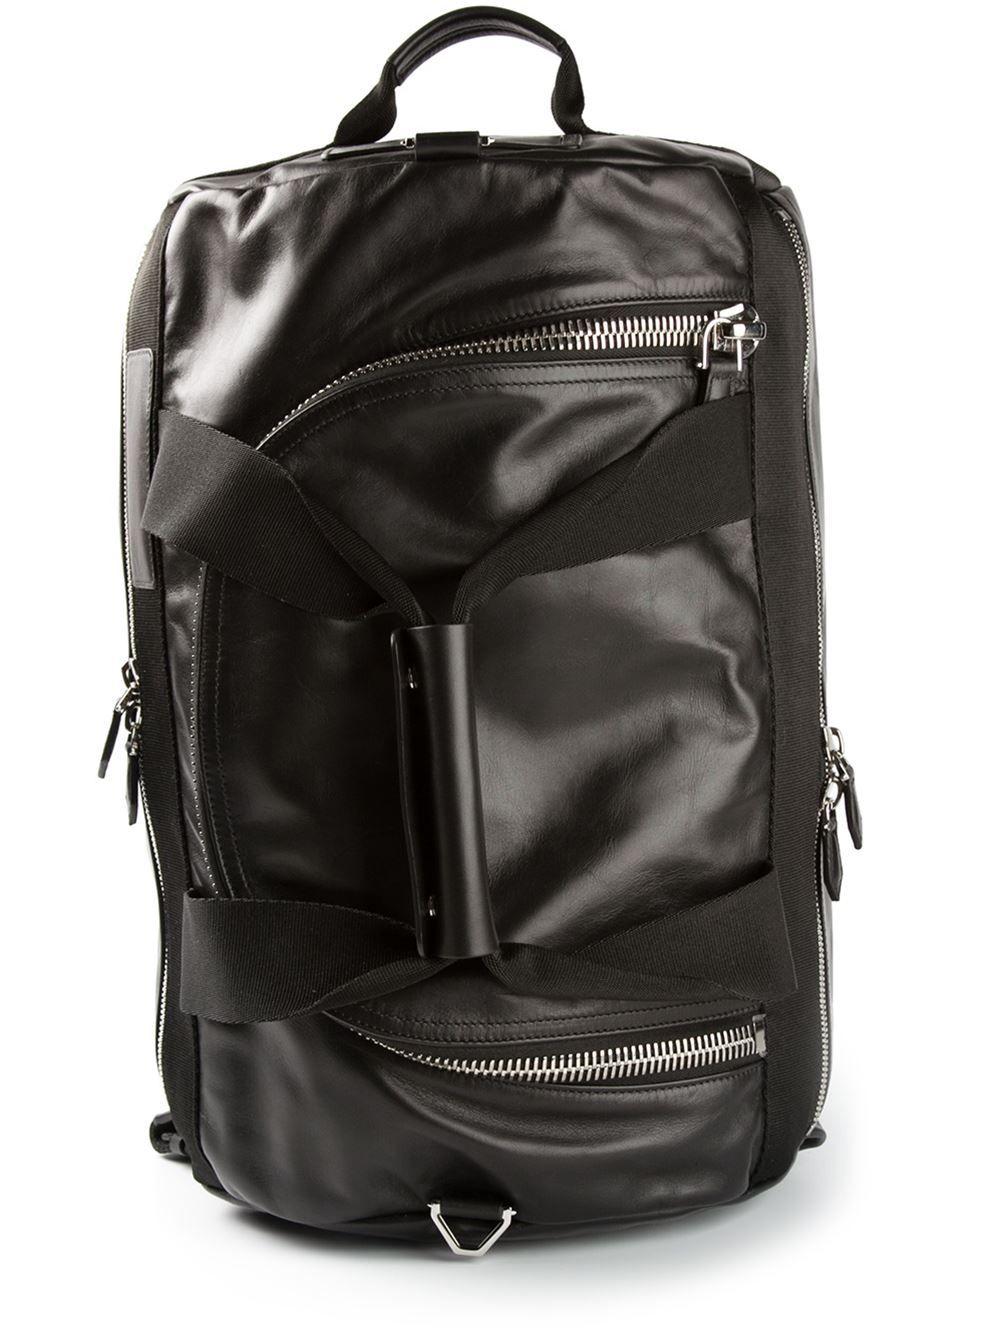 d803d878ca3 Givenchy Medium Zip Shoulder Bag - Dell oglio - Farfetch.com Black Leather  Backpack